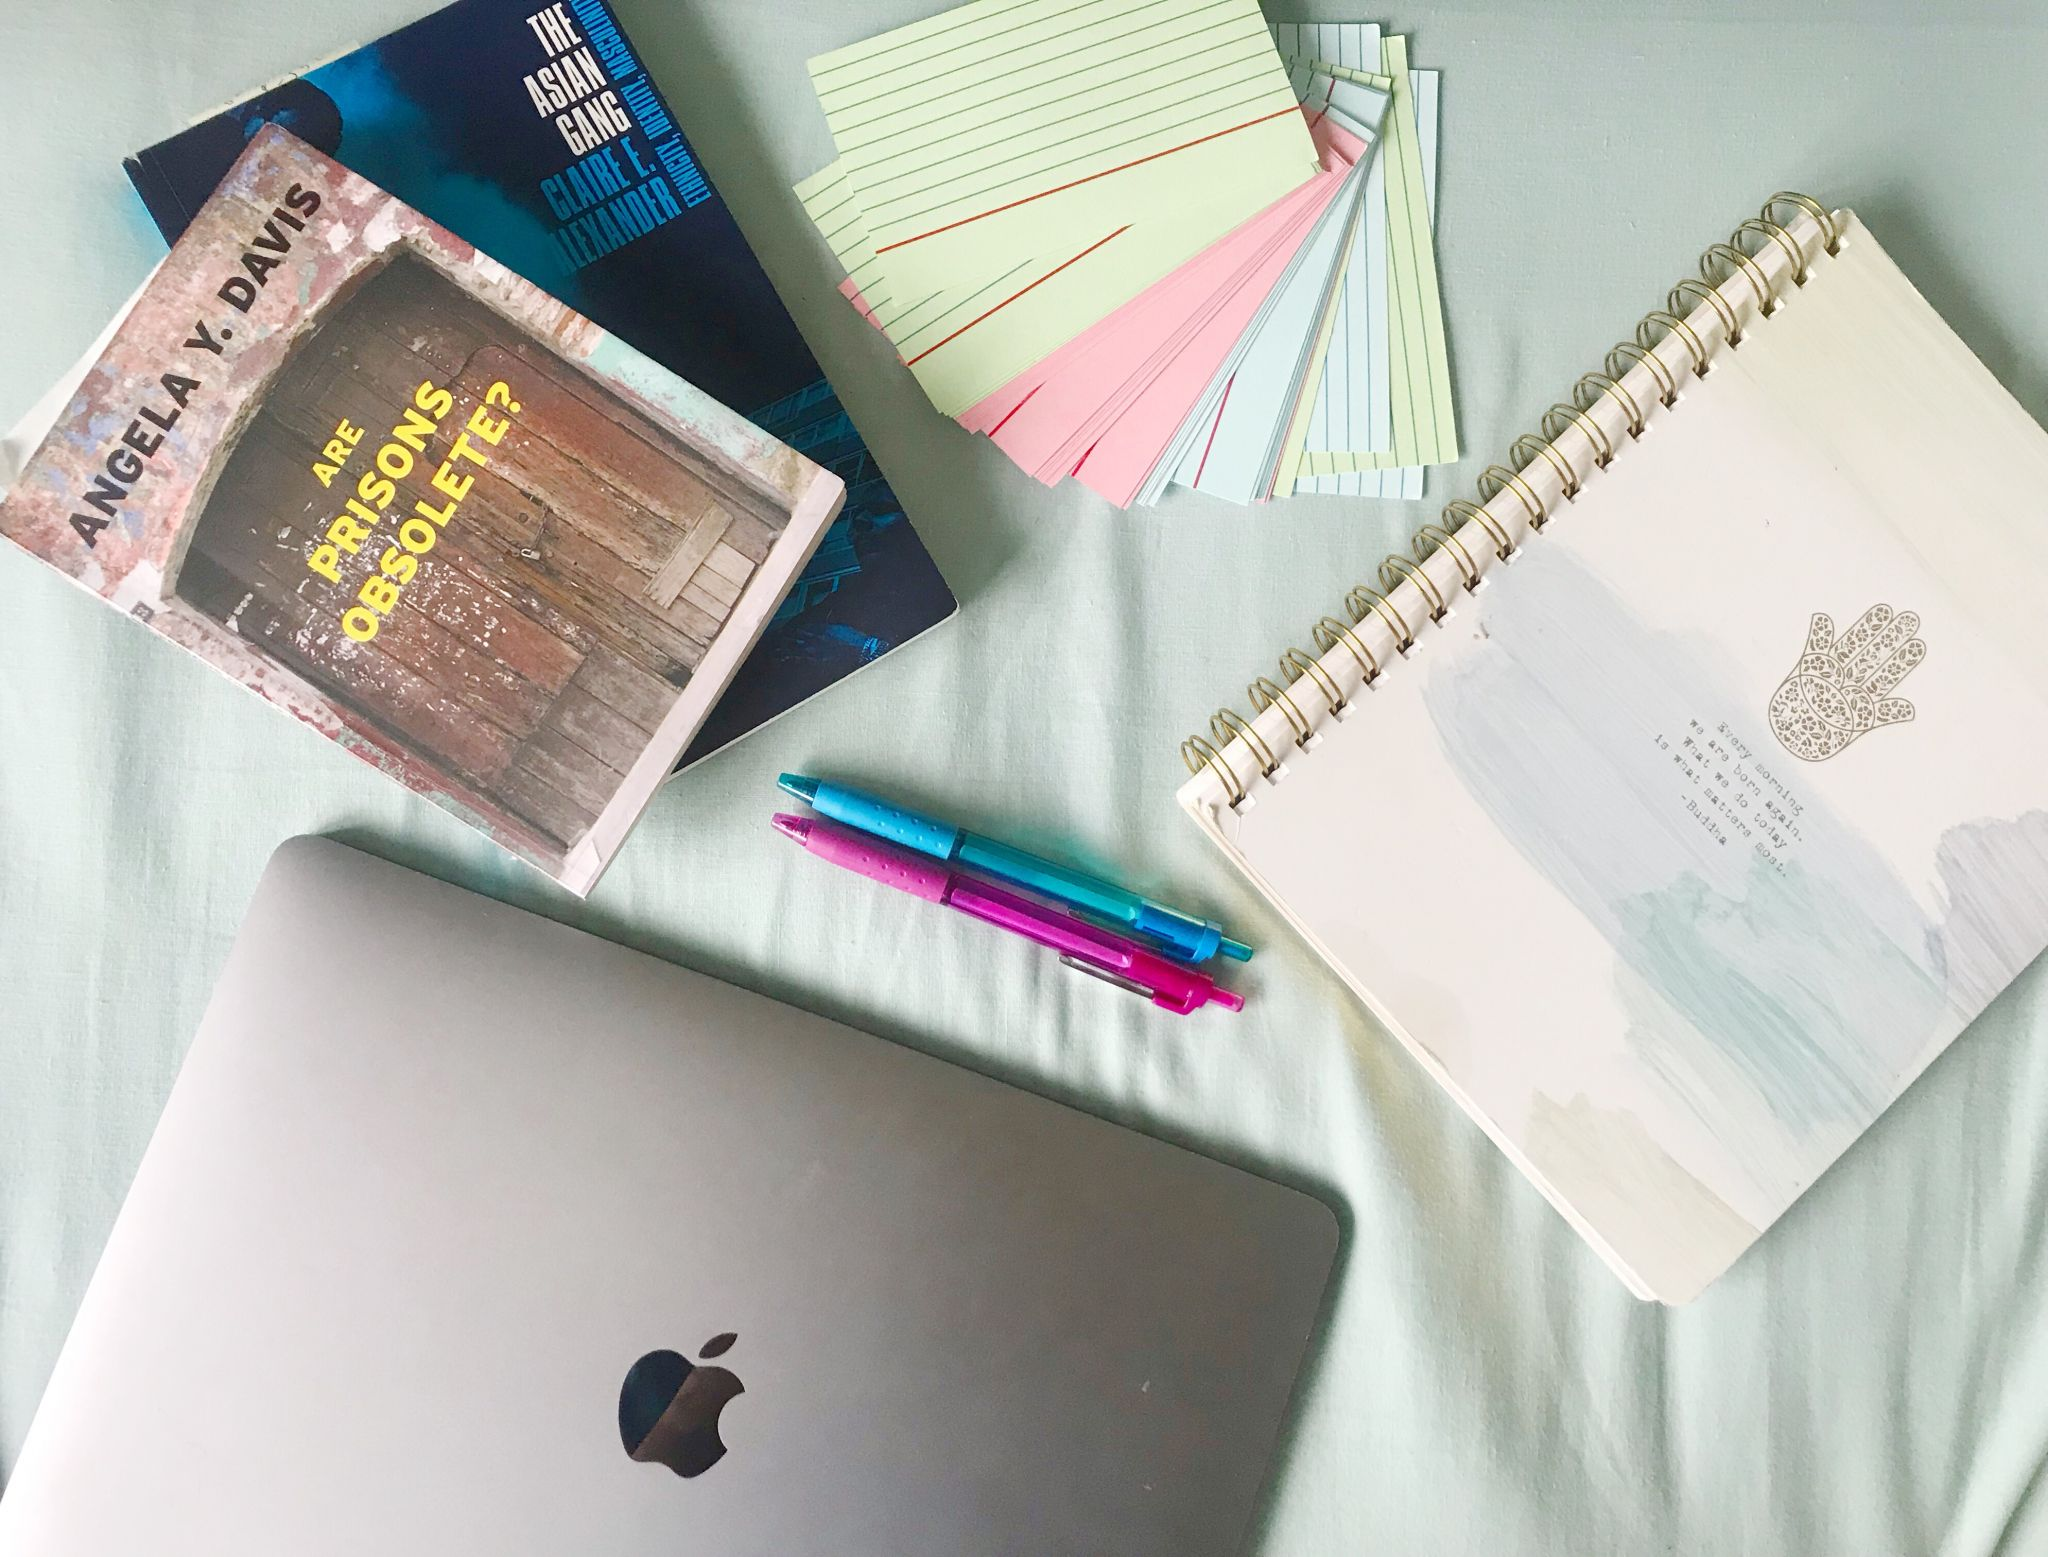 stationery and university/dissertation essentials flat-lay